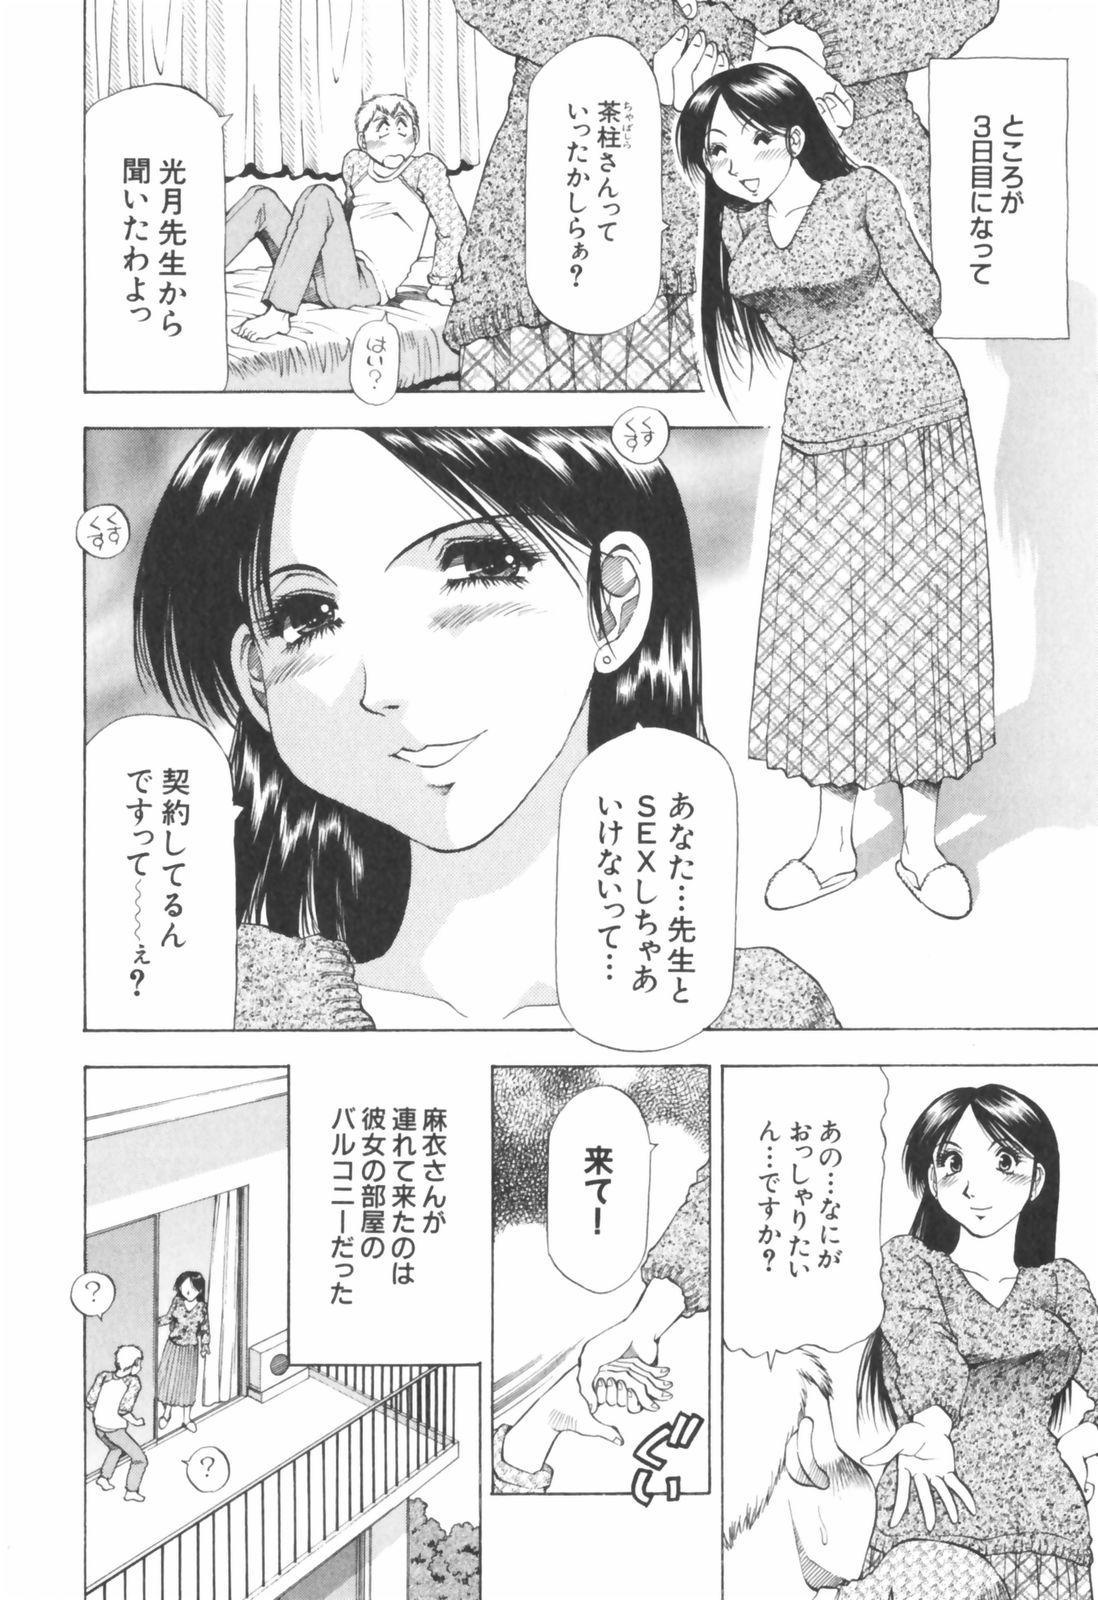 Doukyonin ni Onegai! 73